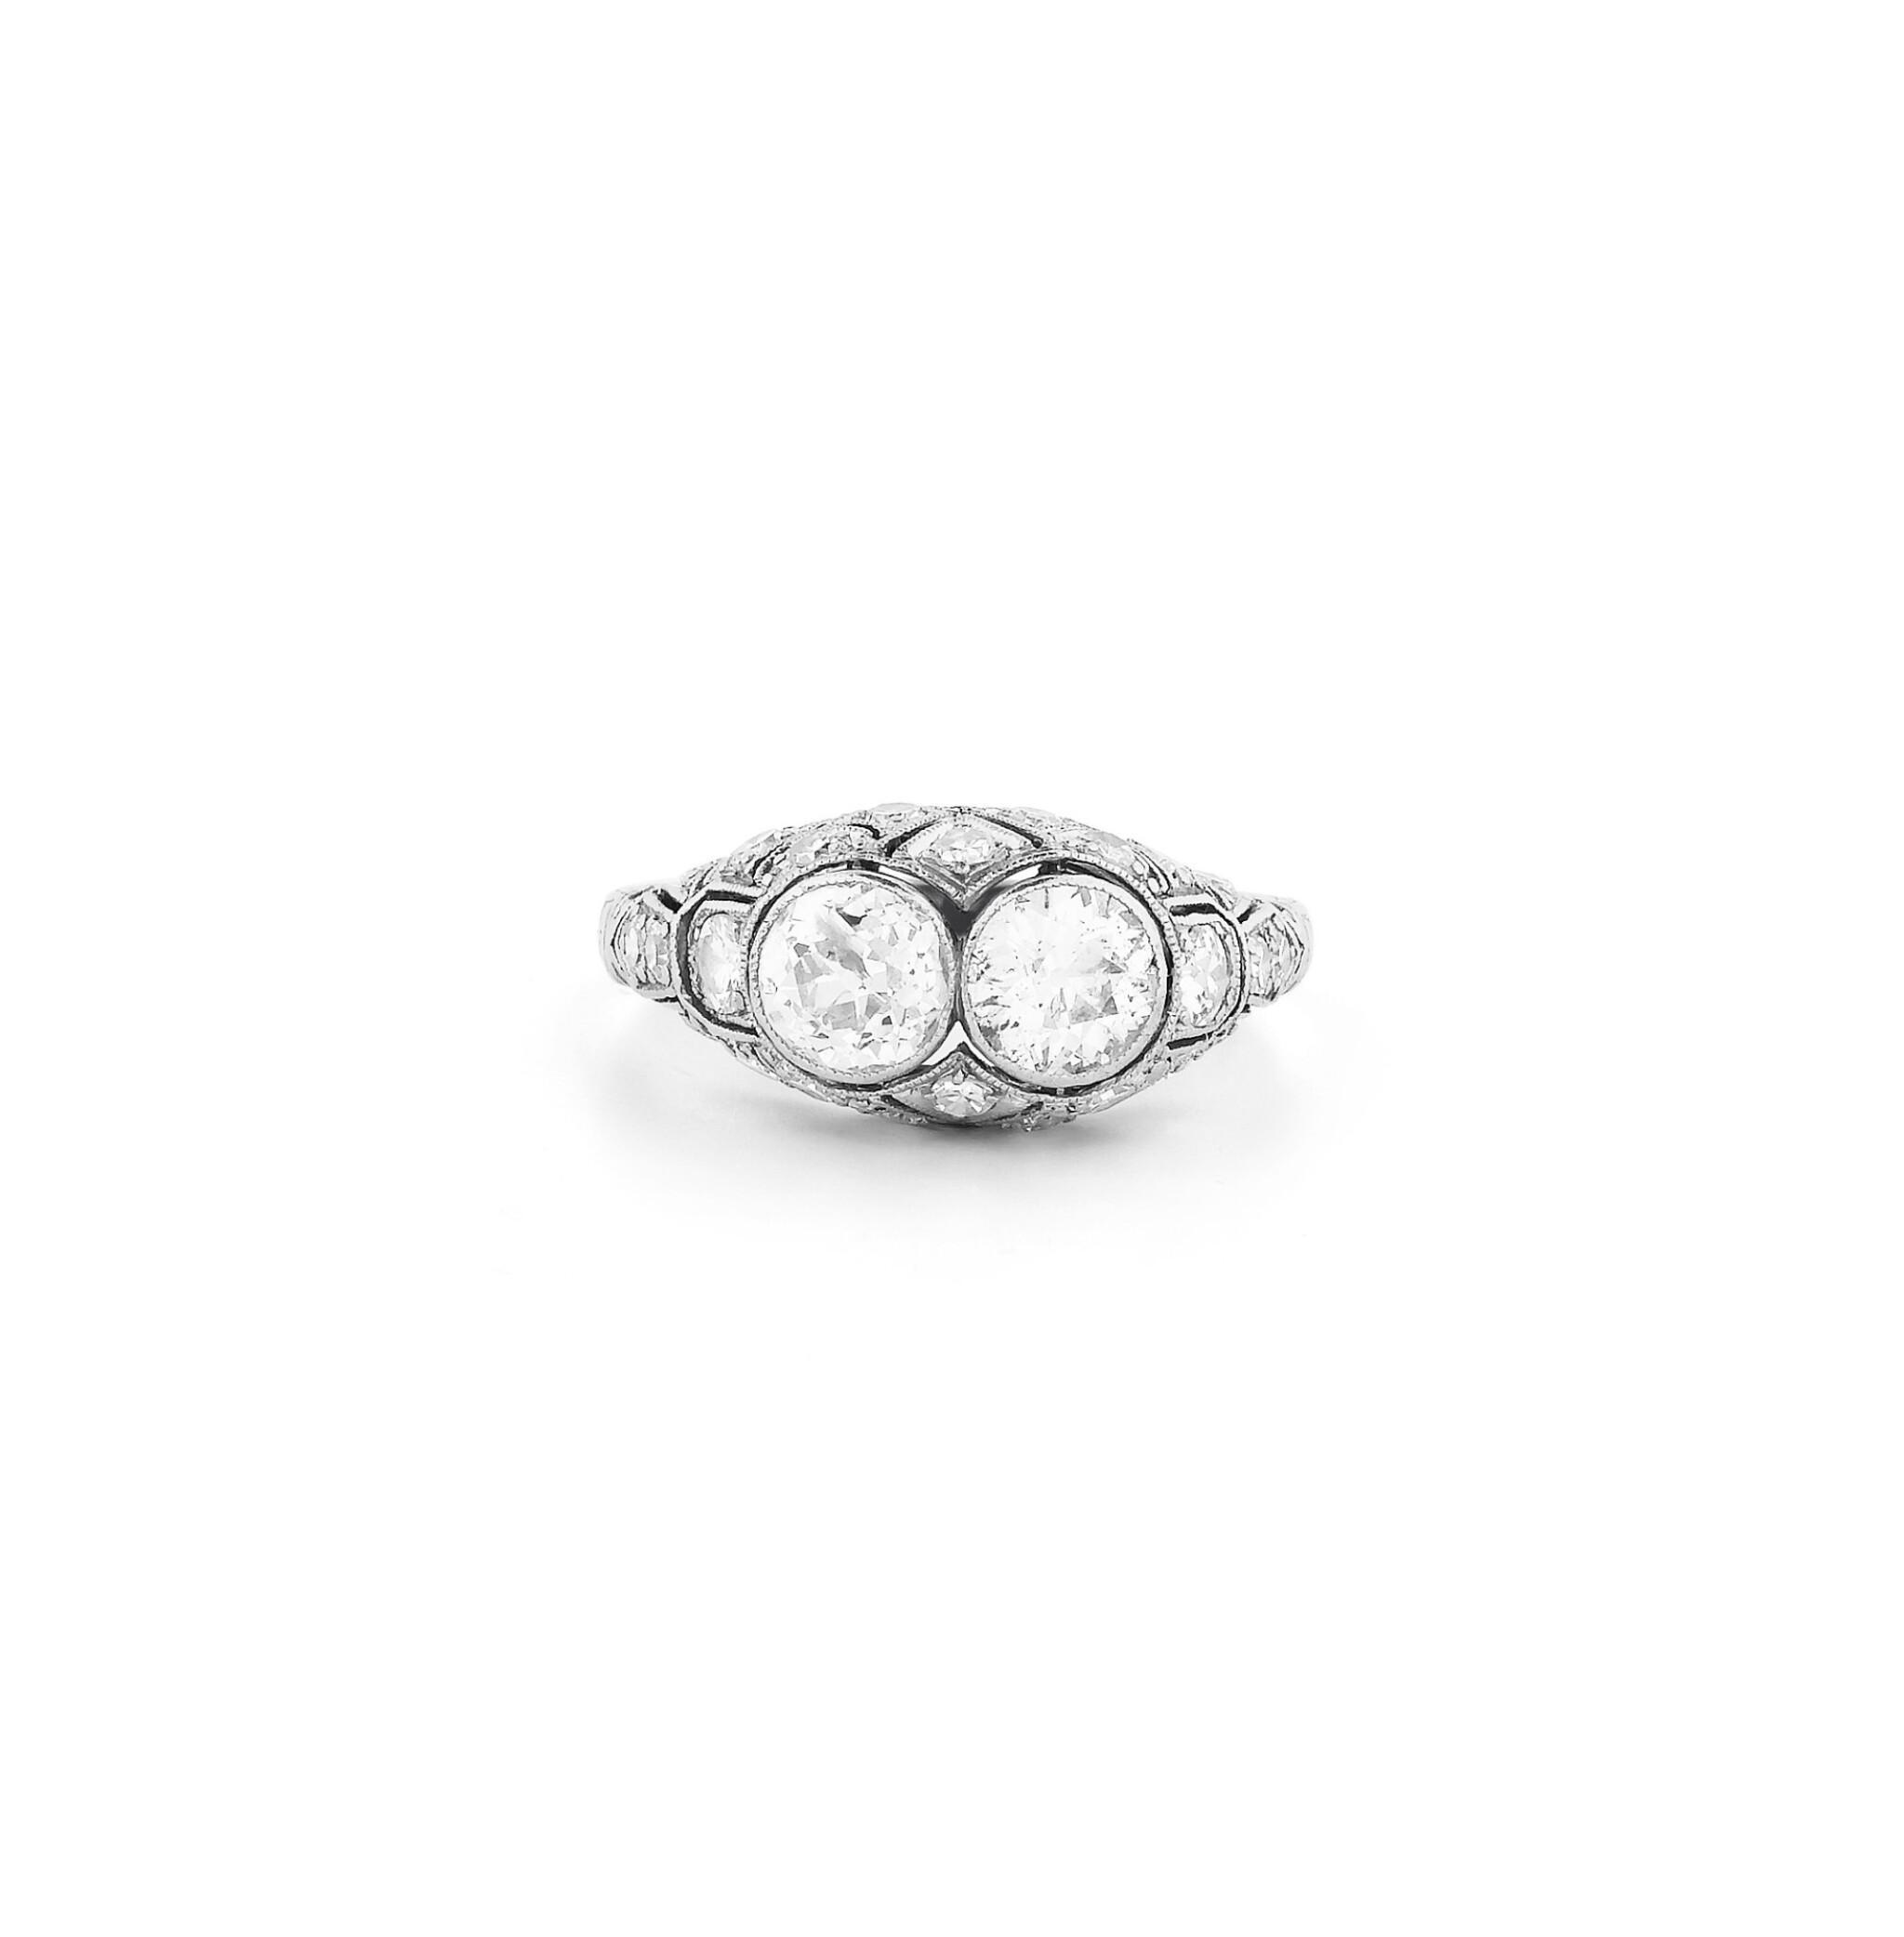 View full screen - View 1 of Lot 14. Bague diamants | Diamond ring.